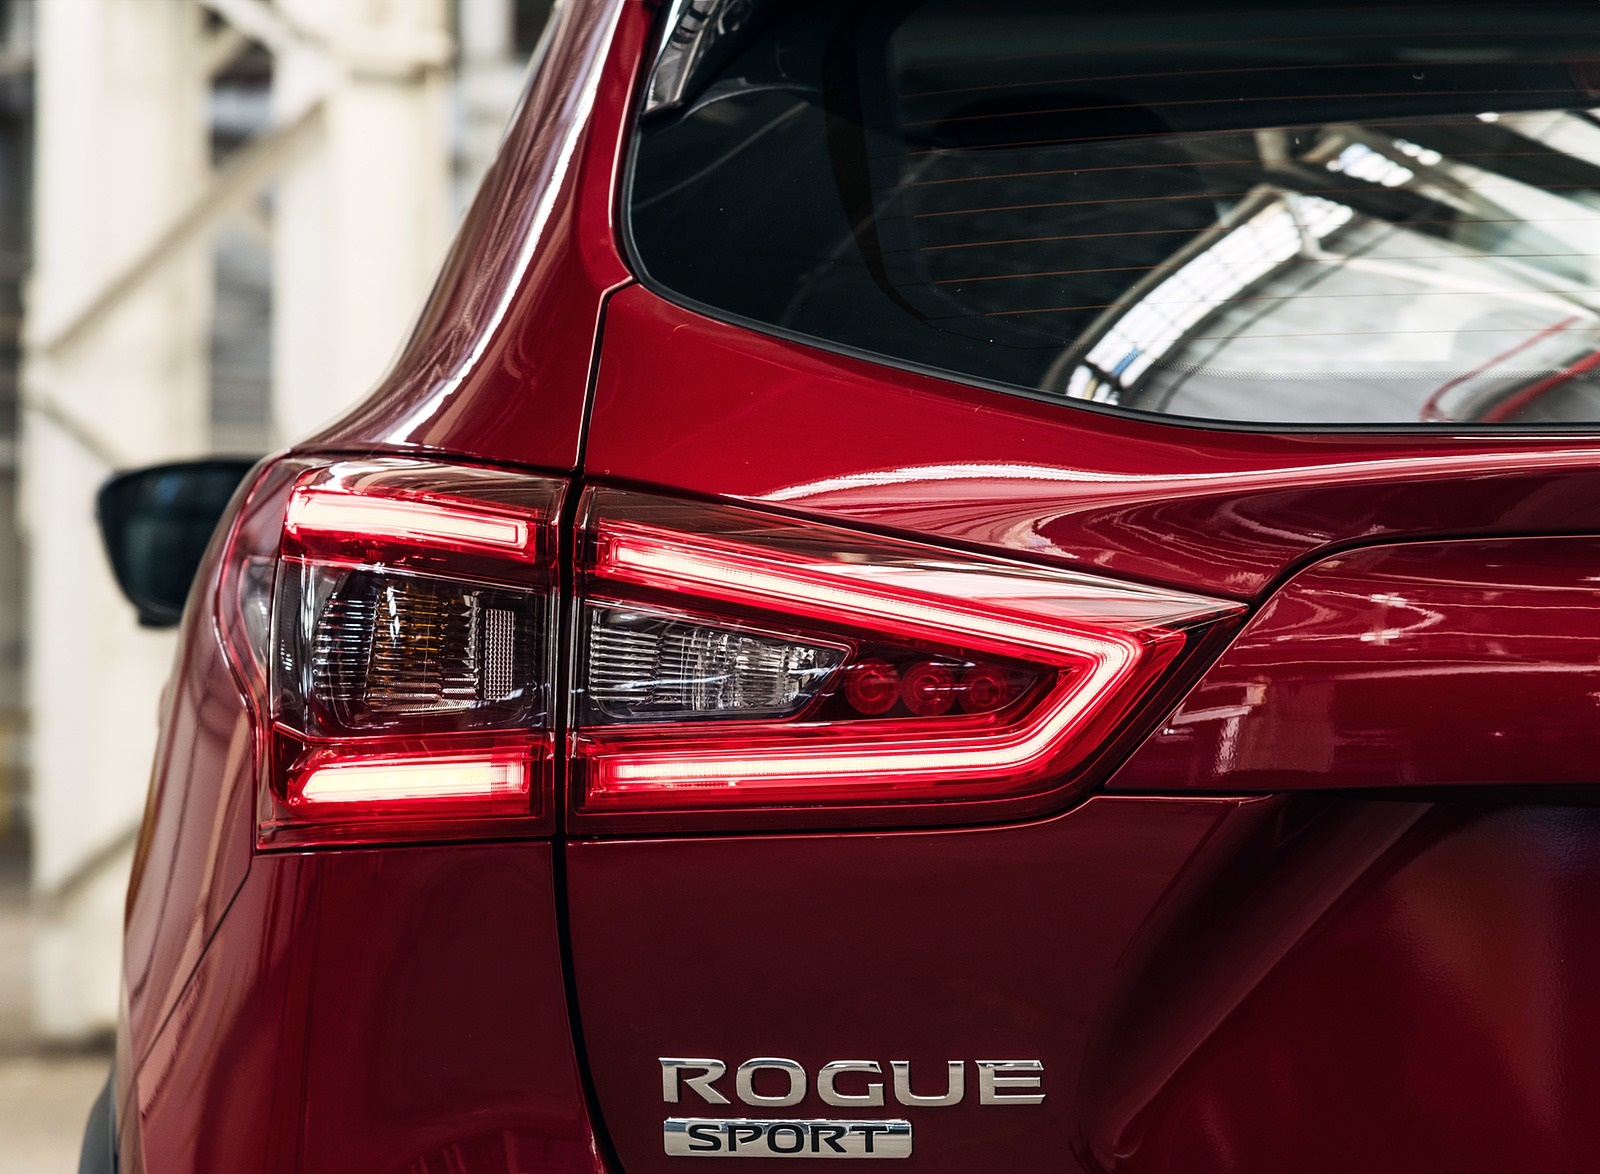 2020 Nissan Rogue Sport Tail Light Wallpapers (13)